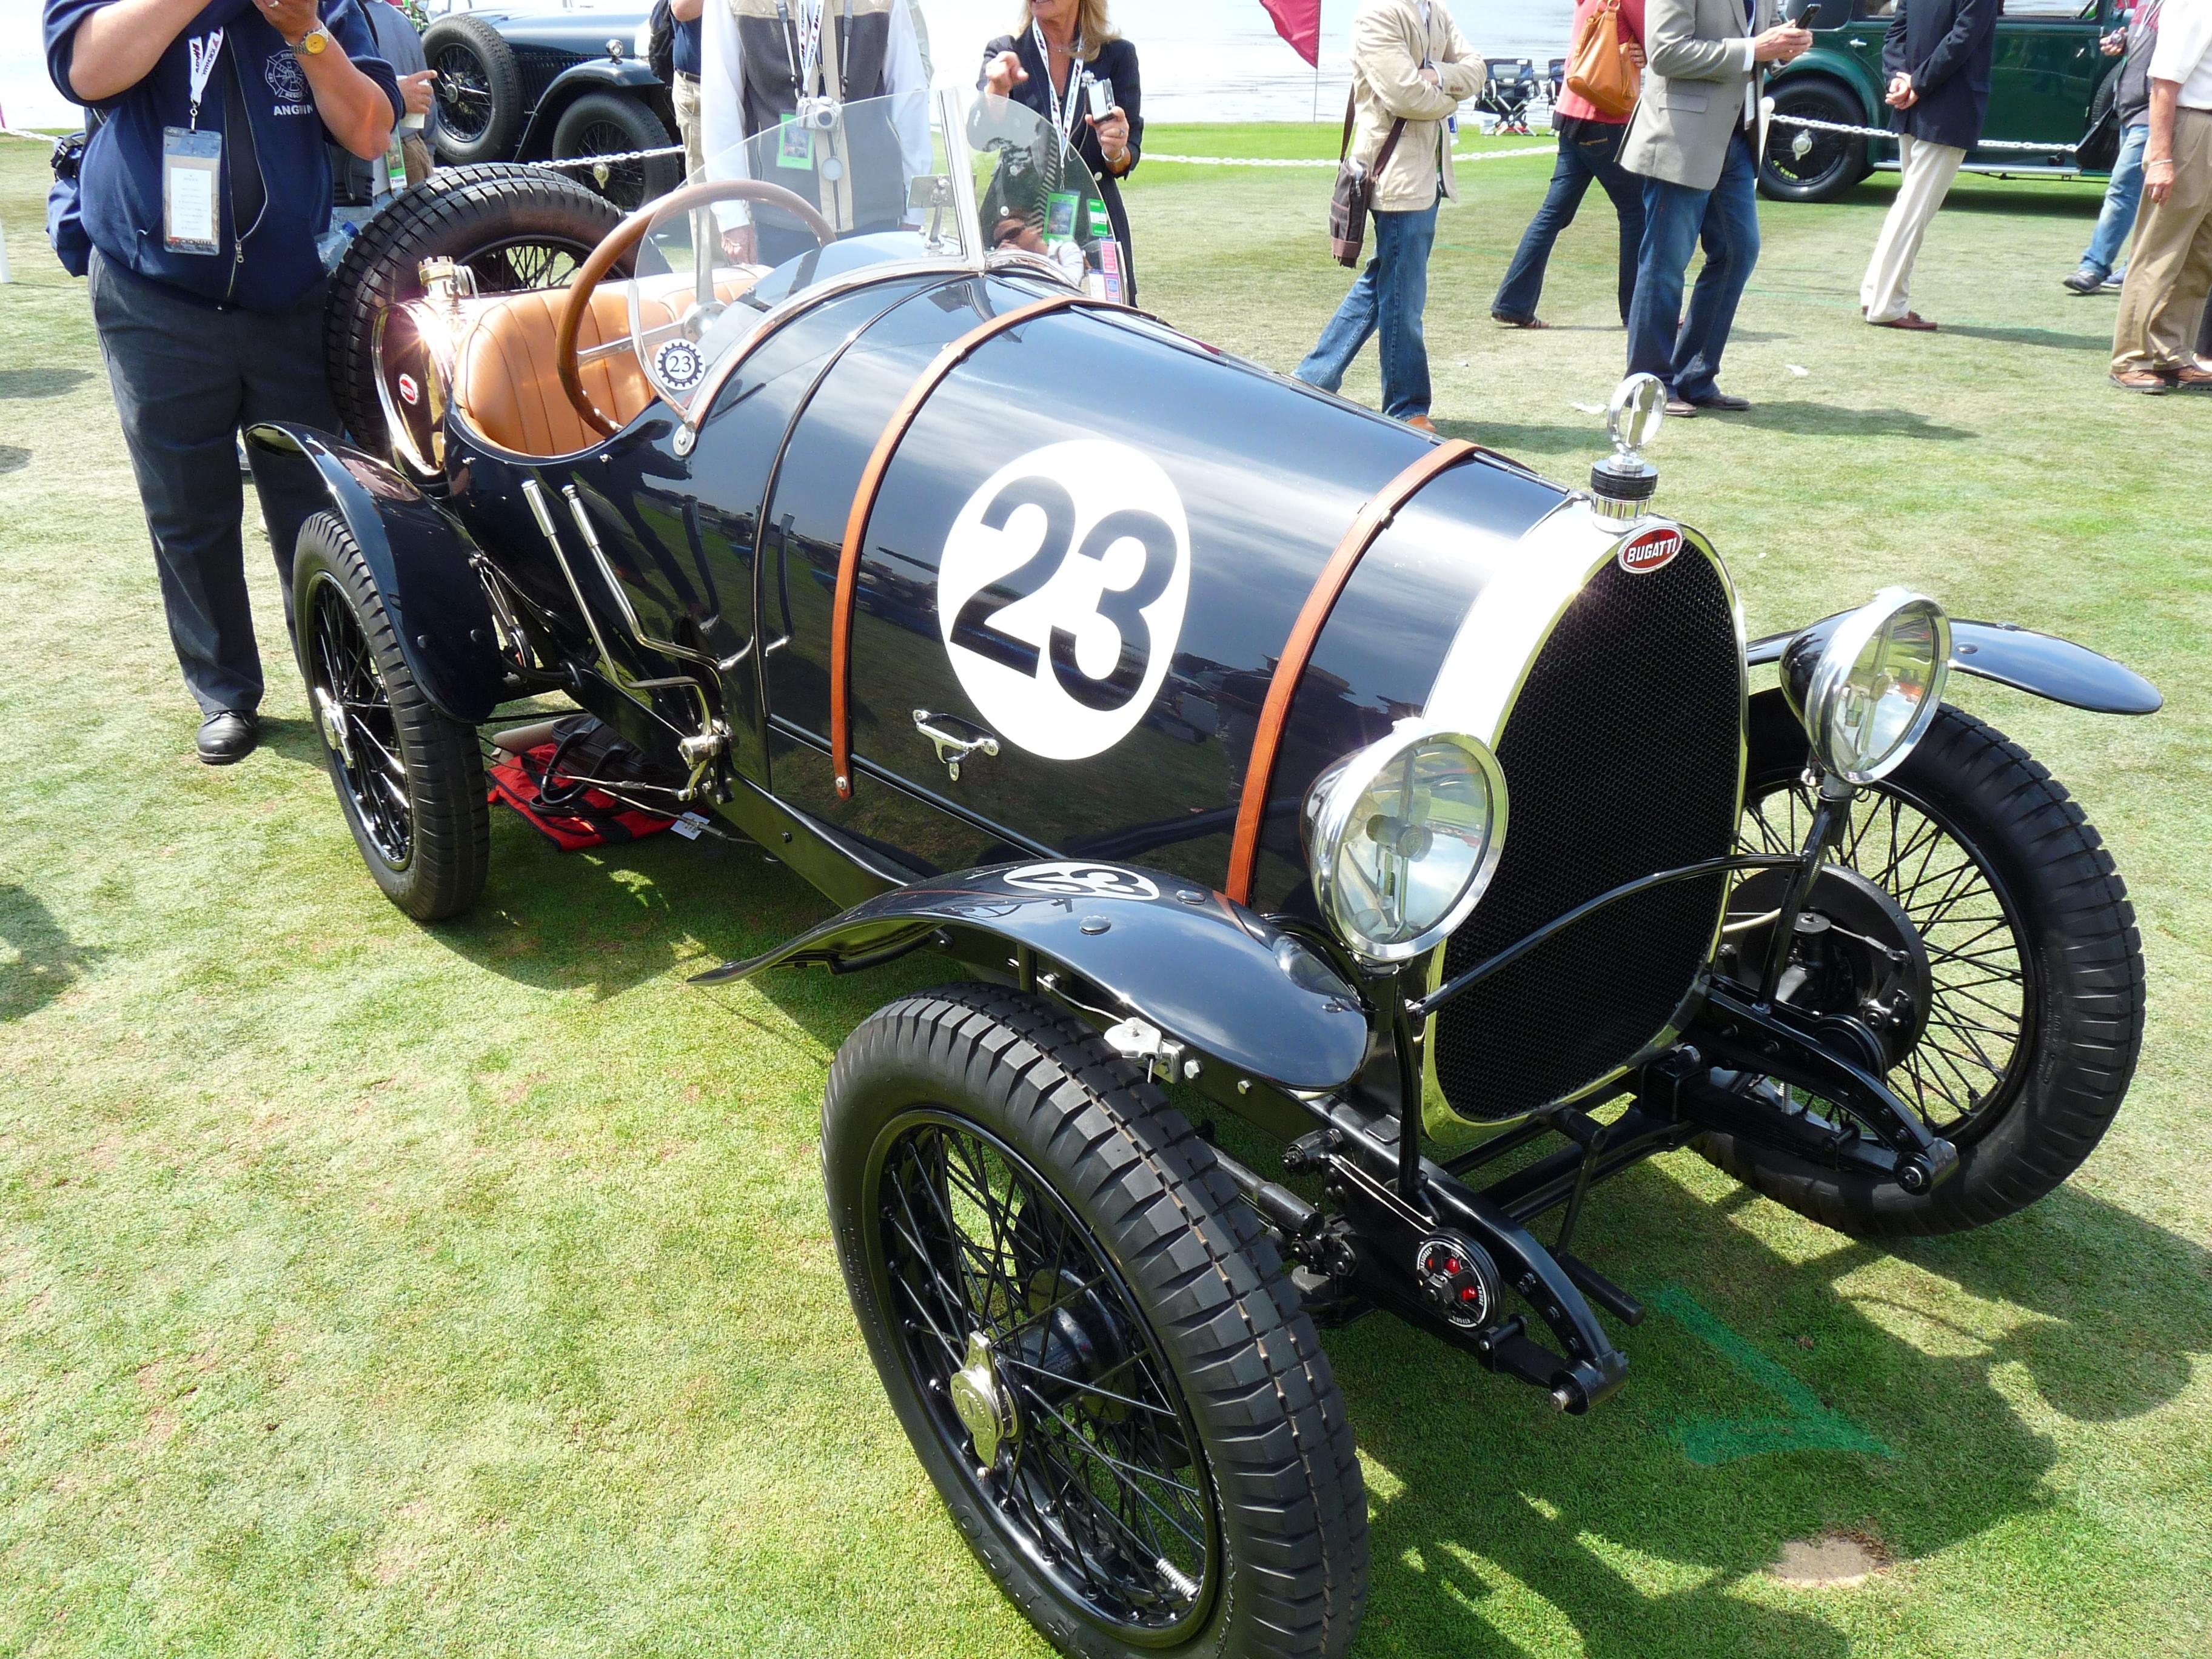 File:1920 Bugatti Type 13 Brescia Dog Cart (3829478088).jpg ... on bugatti type 18, bugatti type 32, bugatti type 1, bugatti type 57, bugatti type 78, bugatti type 40, bugatti type 35, ettore bugatti, bugatti type 51, bugatti type 55, bugatti type 50, bugatti type 59, bugatti type 44, bugatti type 53, bugatti eb118, bugatti 16c galibier concept, bugatti z type, bugatti type 101, bugatti type 252, bugatti 18/3 chiron, bugatti type 43, bugatti type 46, bugatti type 30, bugatti type 10, bugatti type 49, alfa romeo p2, bugatti type 35b,